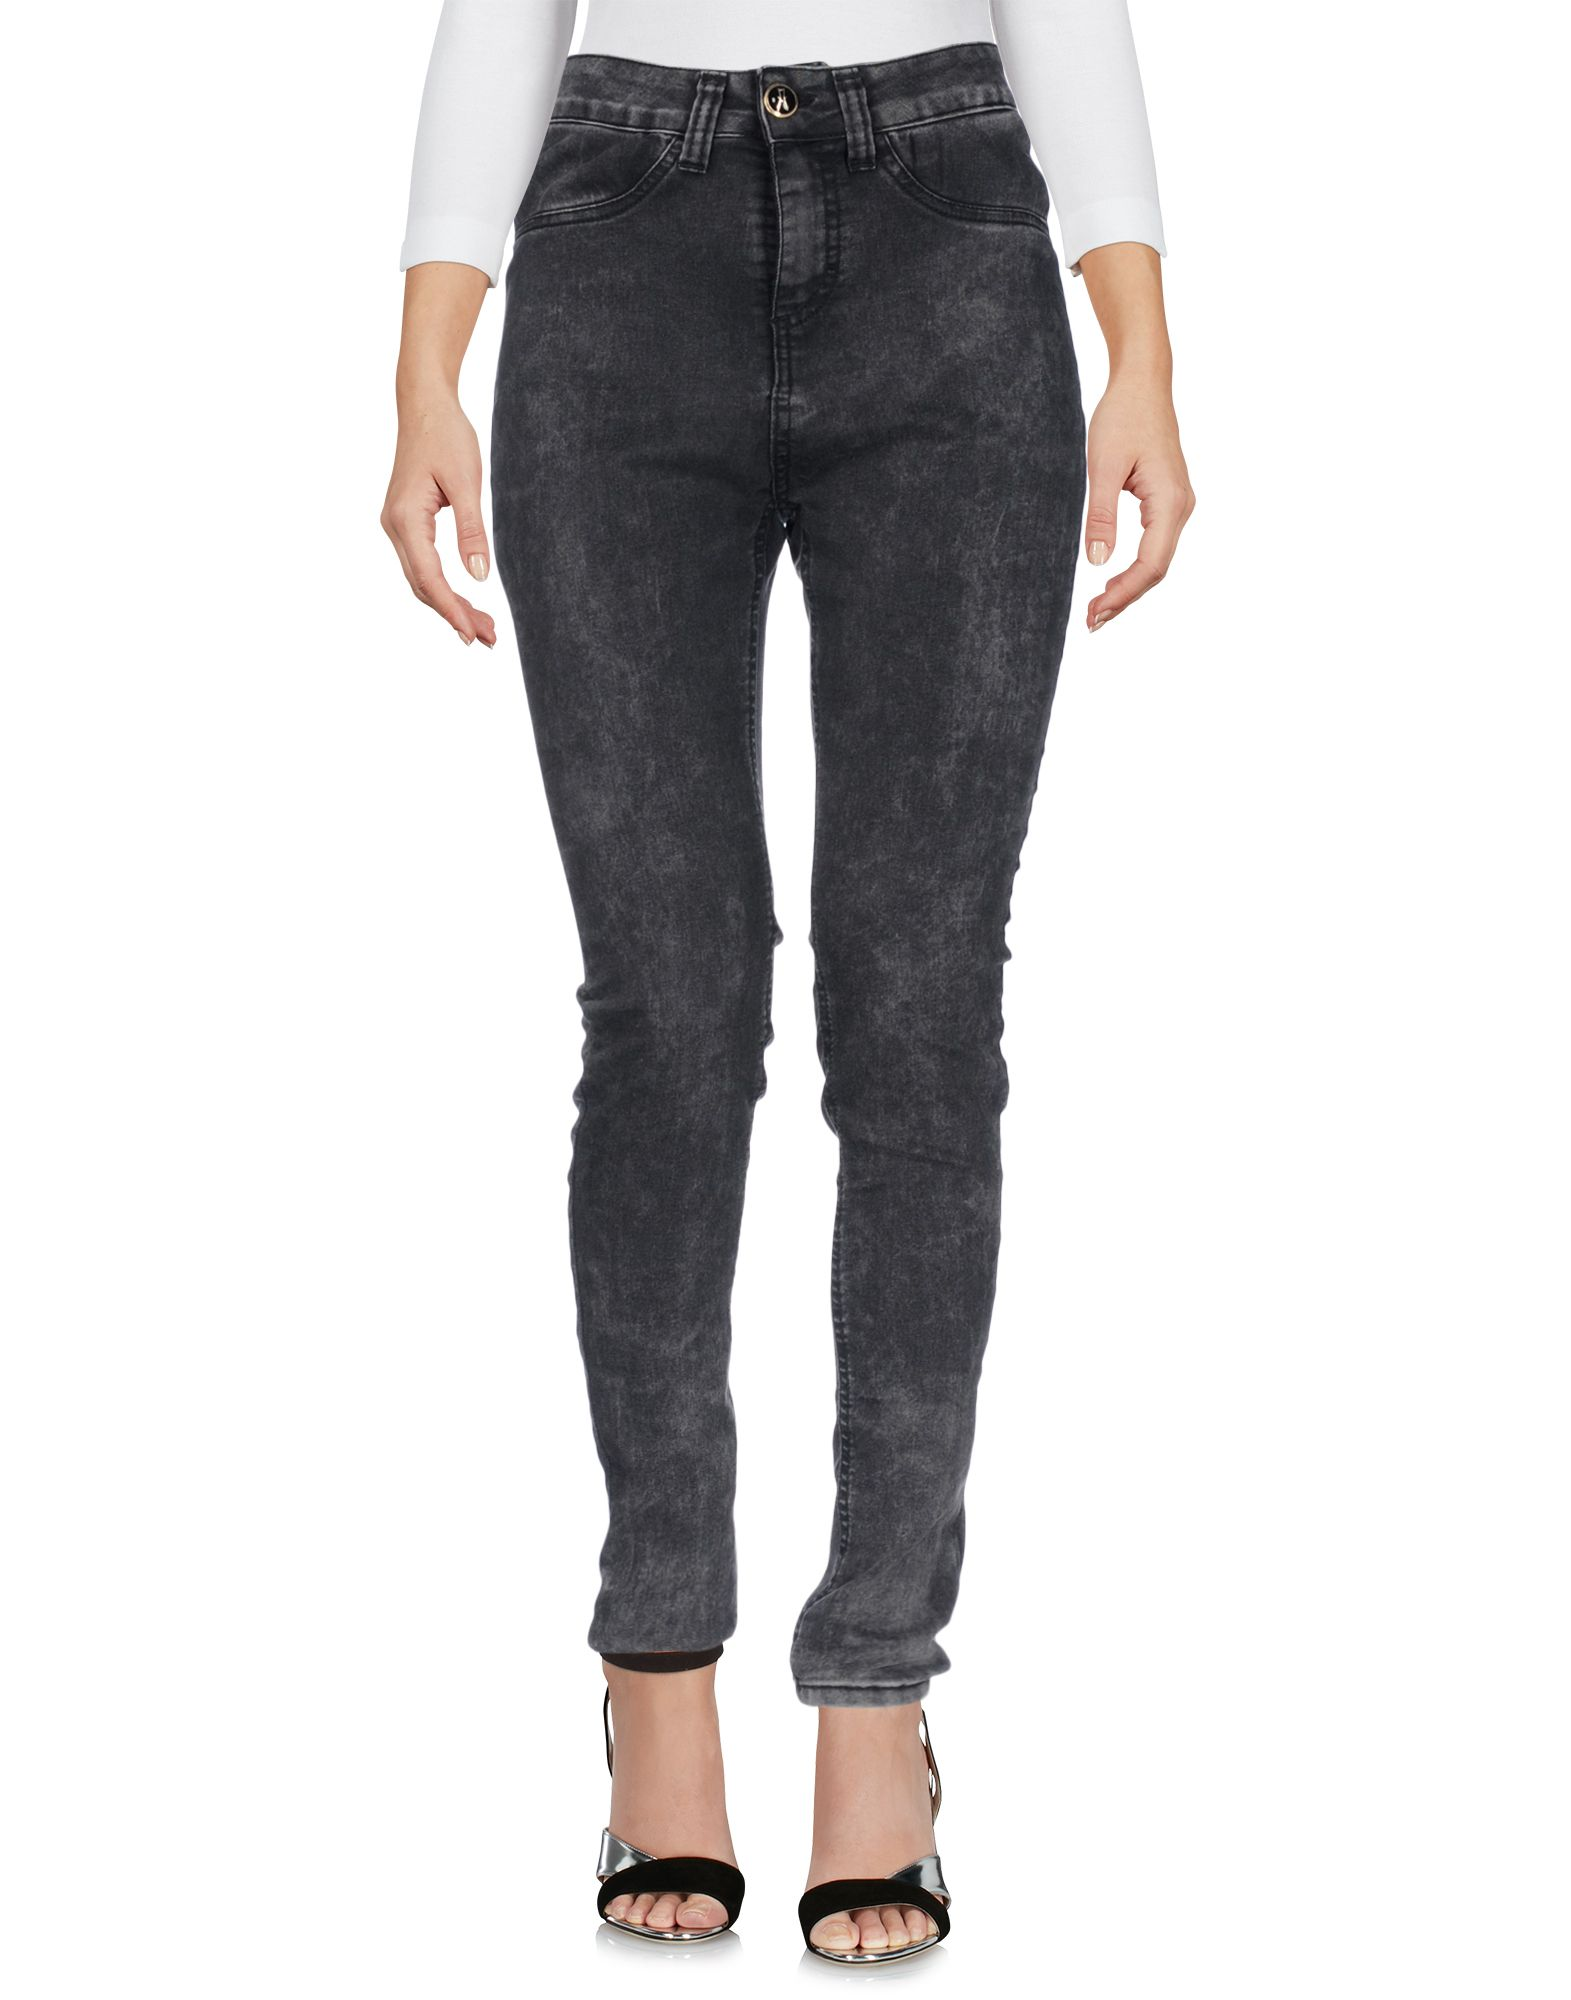 ANIYE BY Damen Jeanshose Farbe Schwarz Größe 6